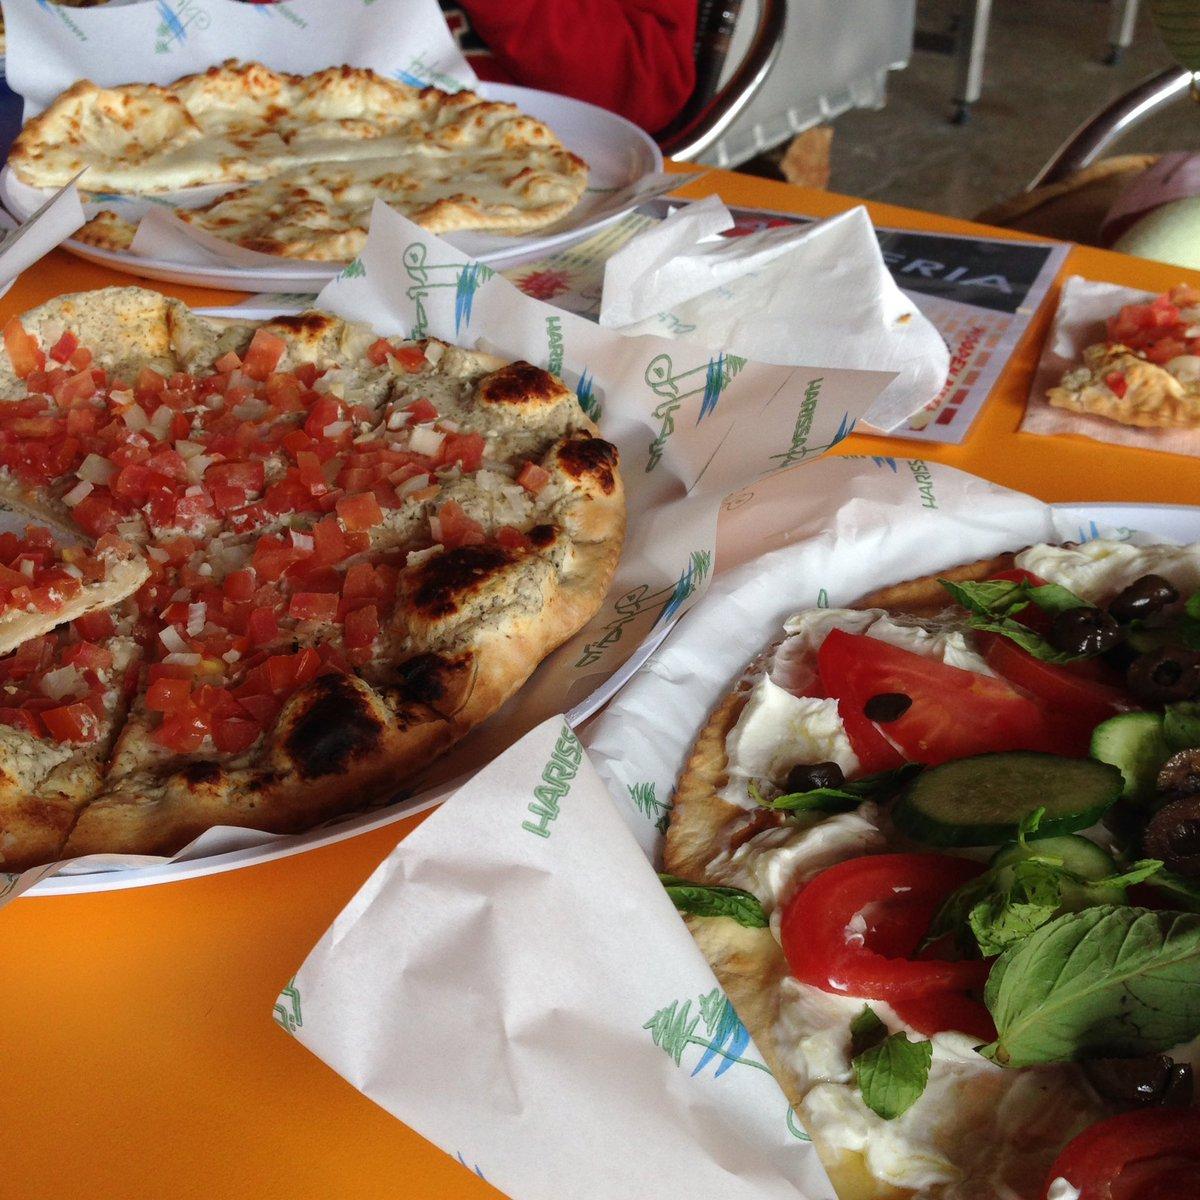 food of Lebanon  repas libanais  #juliaaoun #food  #repas #repaslibanais #lebanonfood  #cuisinelibanaise #lebanoncuisine @aoun_julia<br>http://pic.twitter.com/tILw4yKnpg